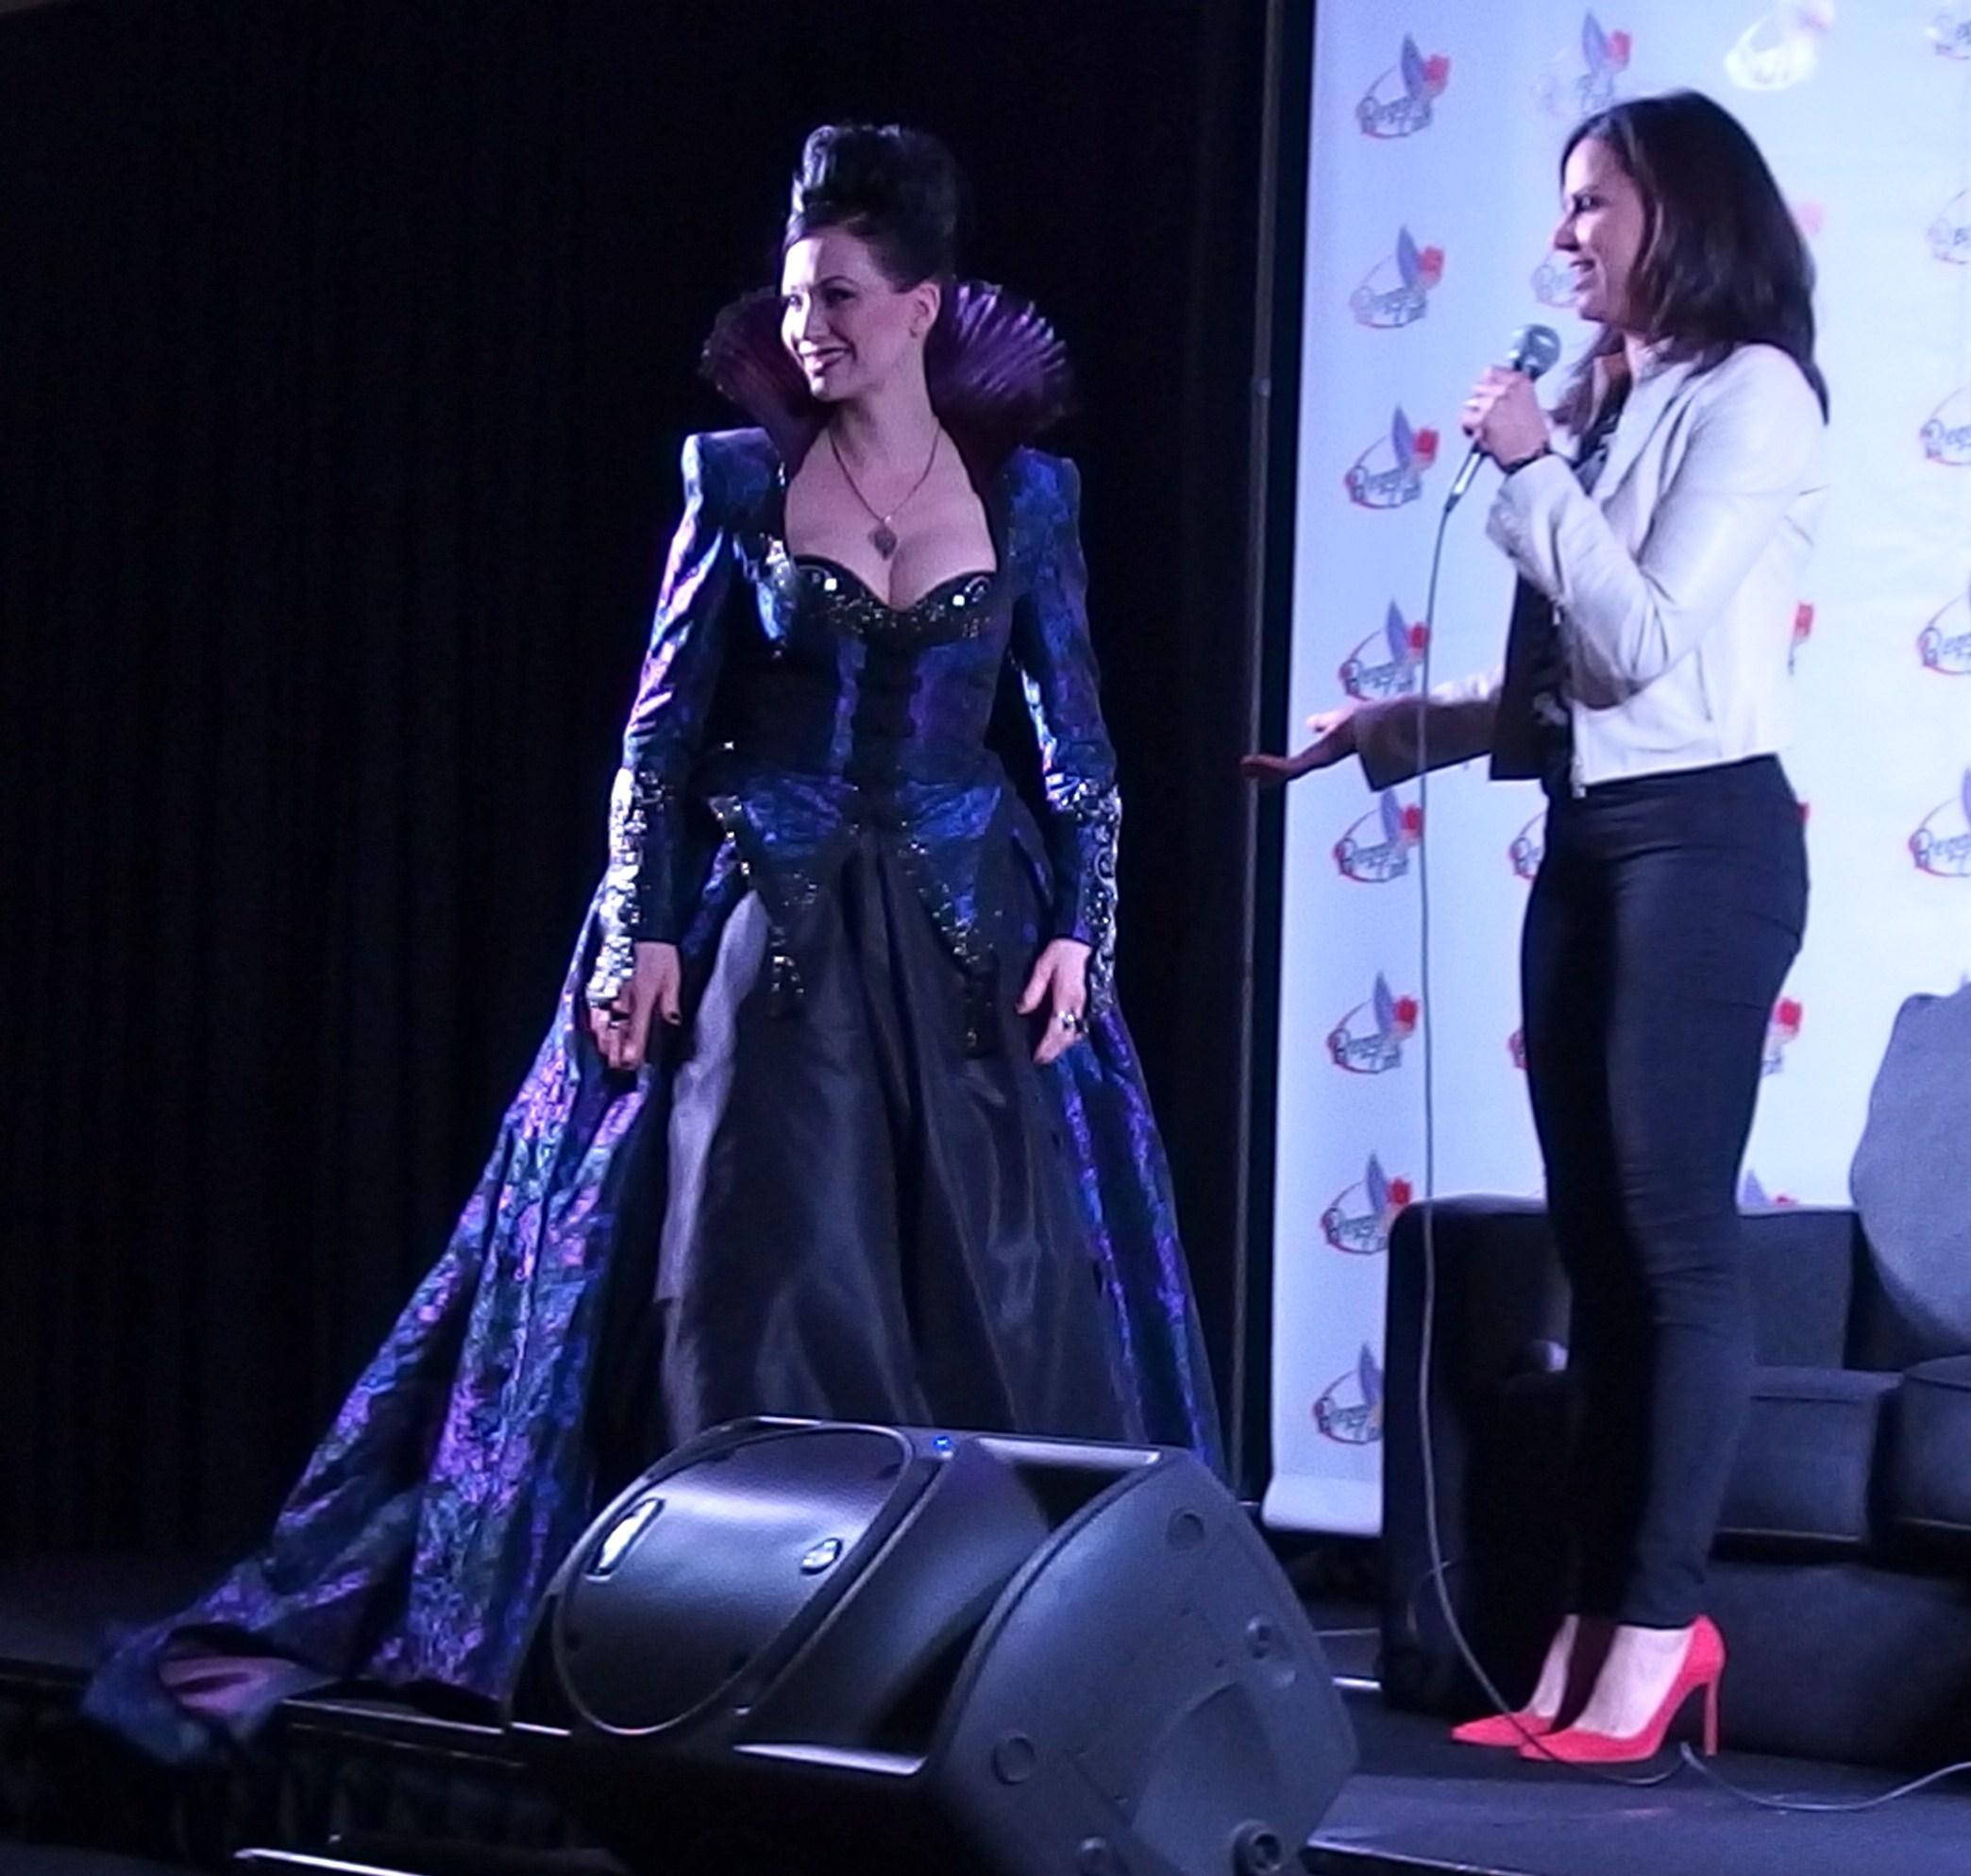 Lana Parilla admires a cosplayer's gown